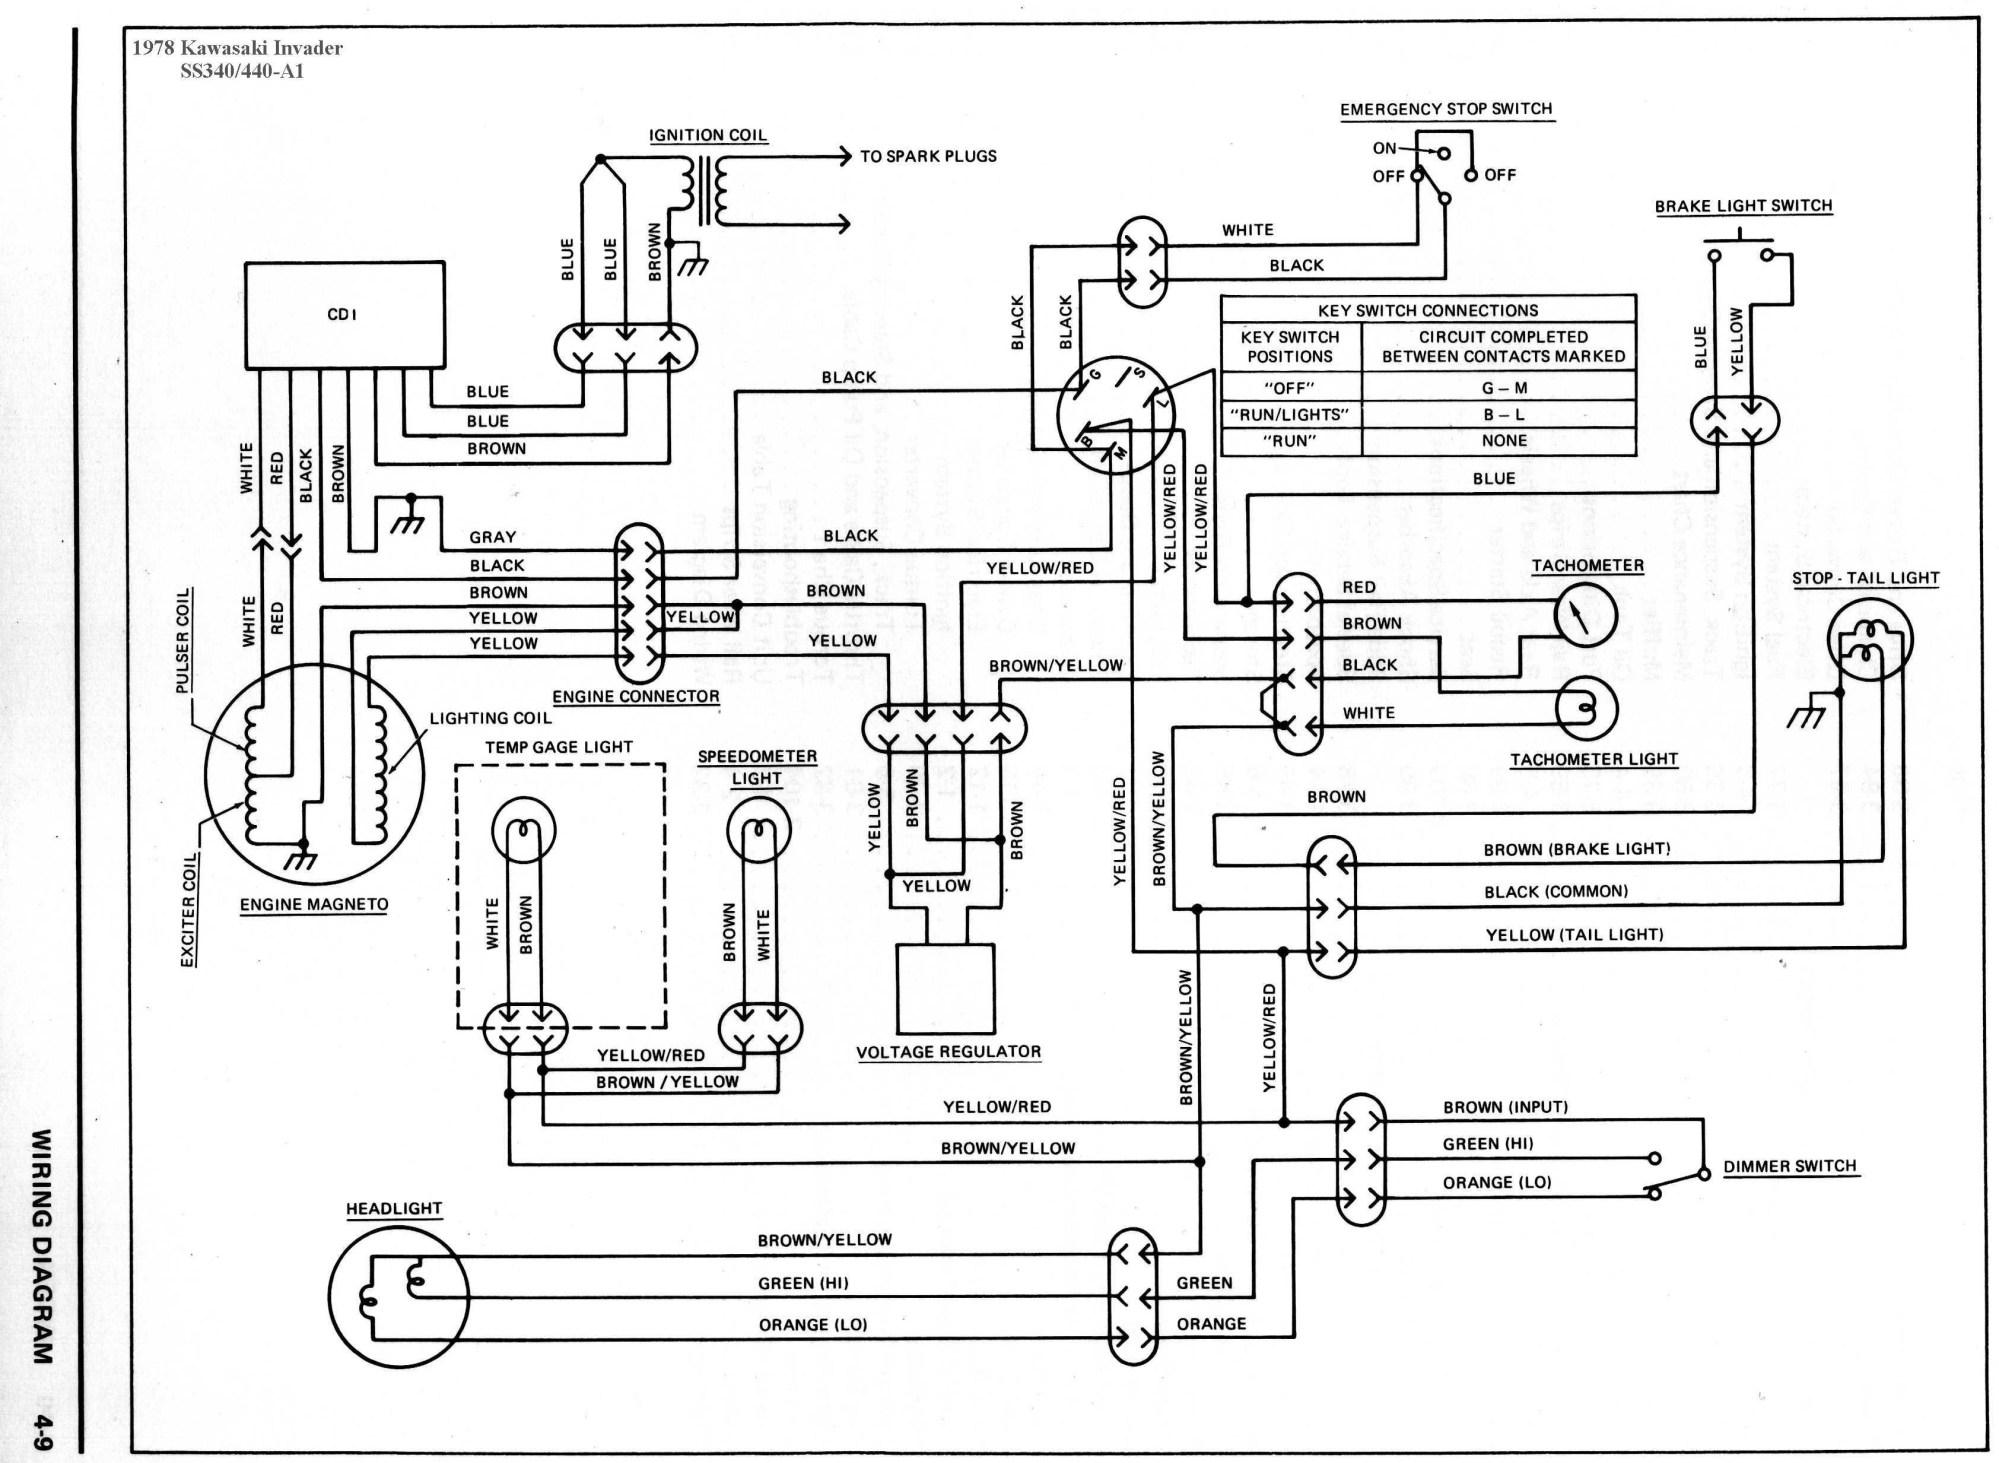 hight resolution of kawasaki mule 550 wiring diagram free wiring diagramkawasaki mule 550 wiring diagram